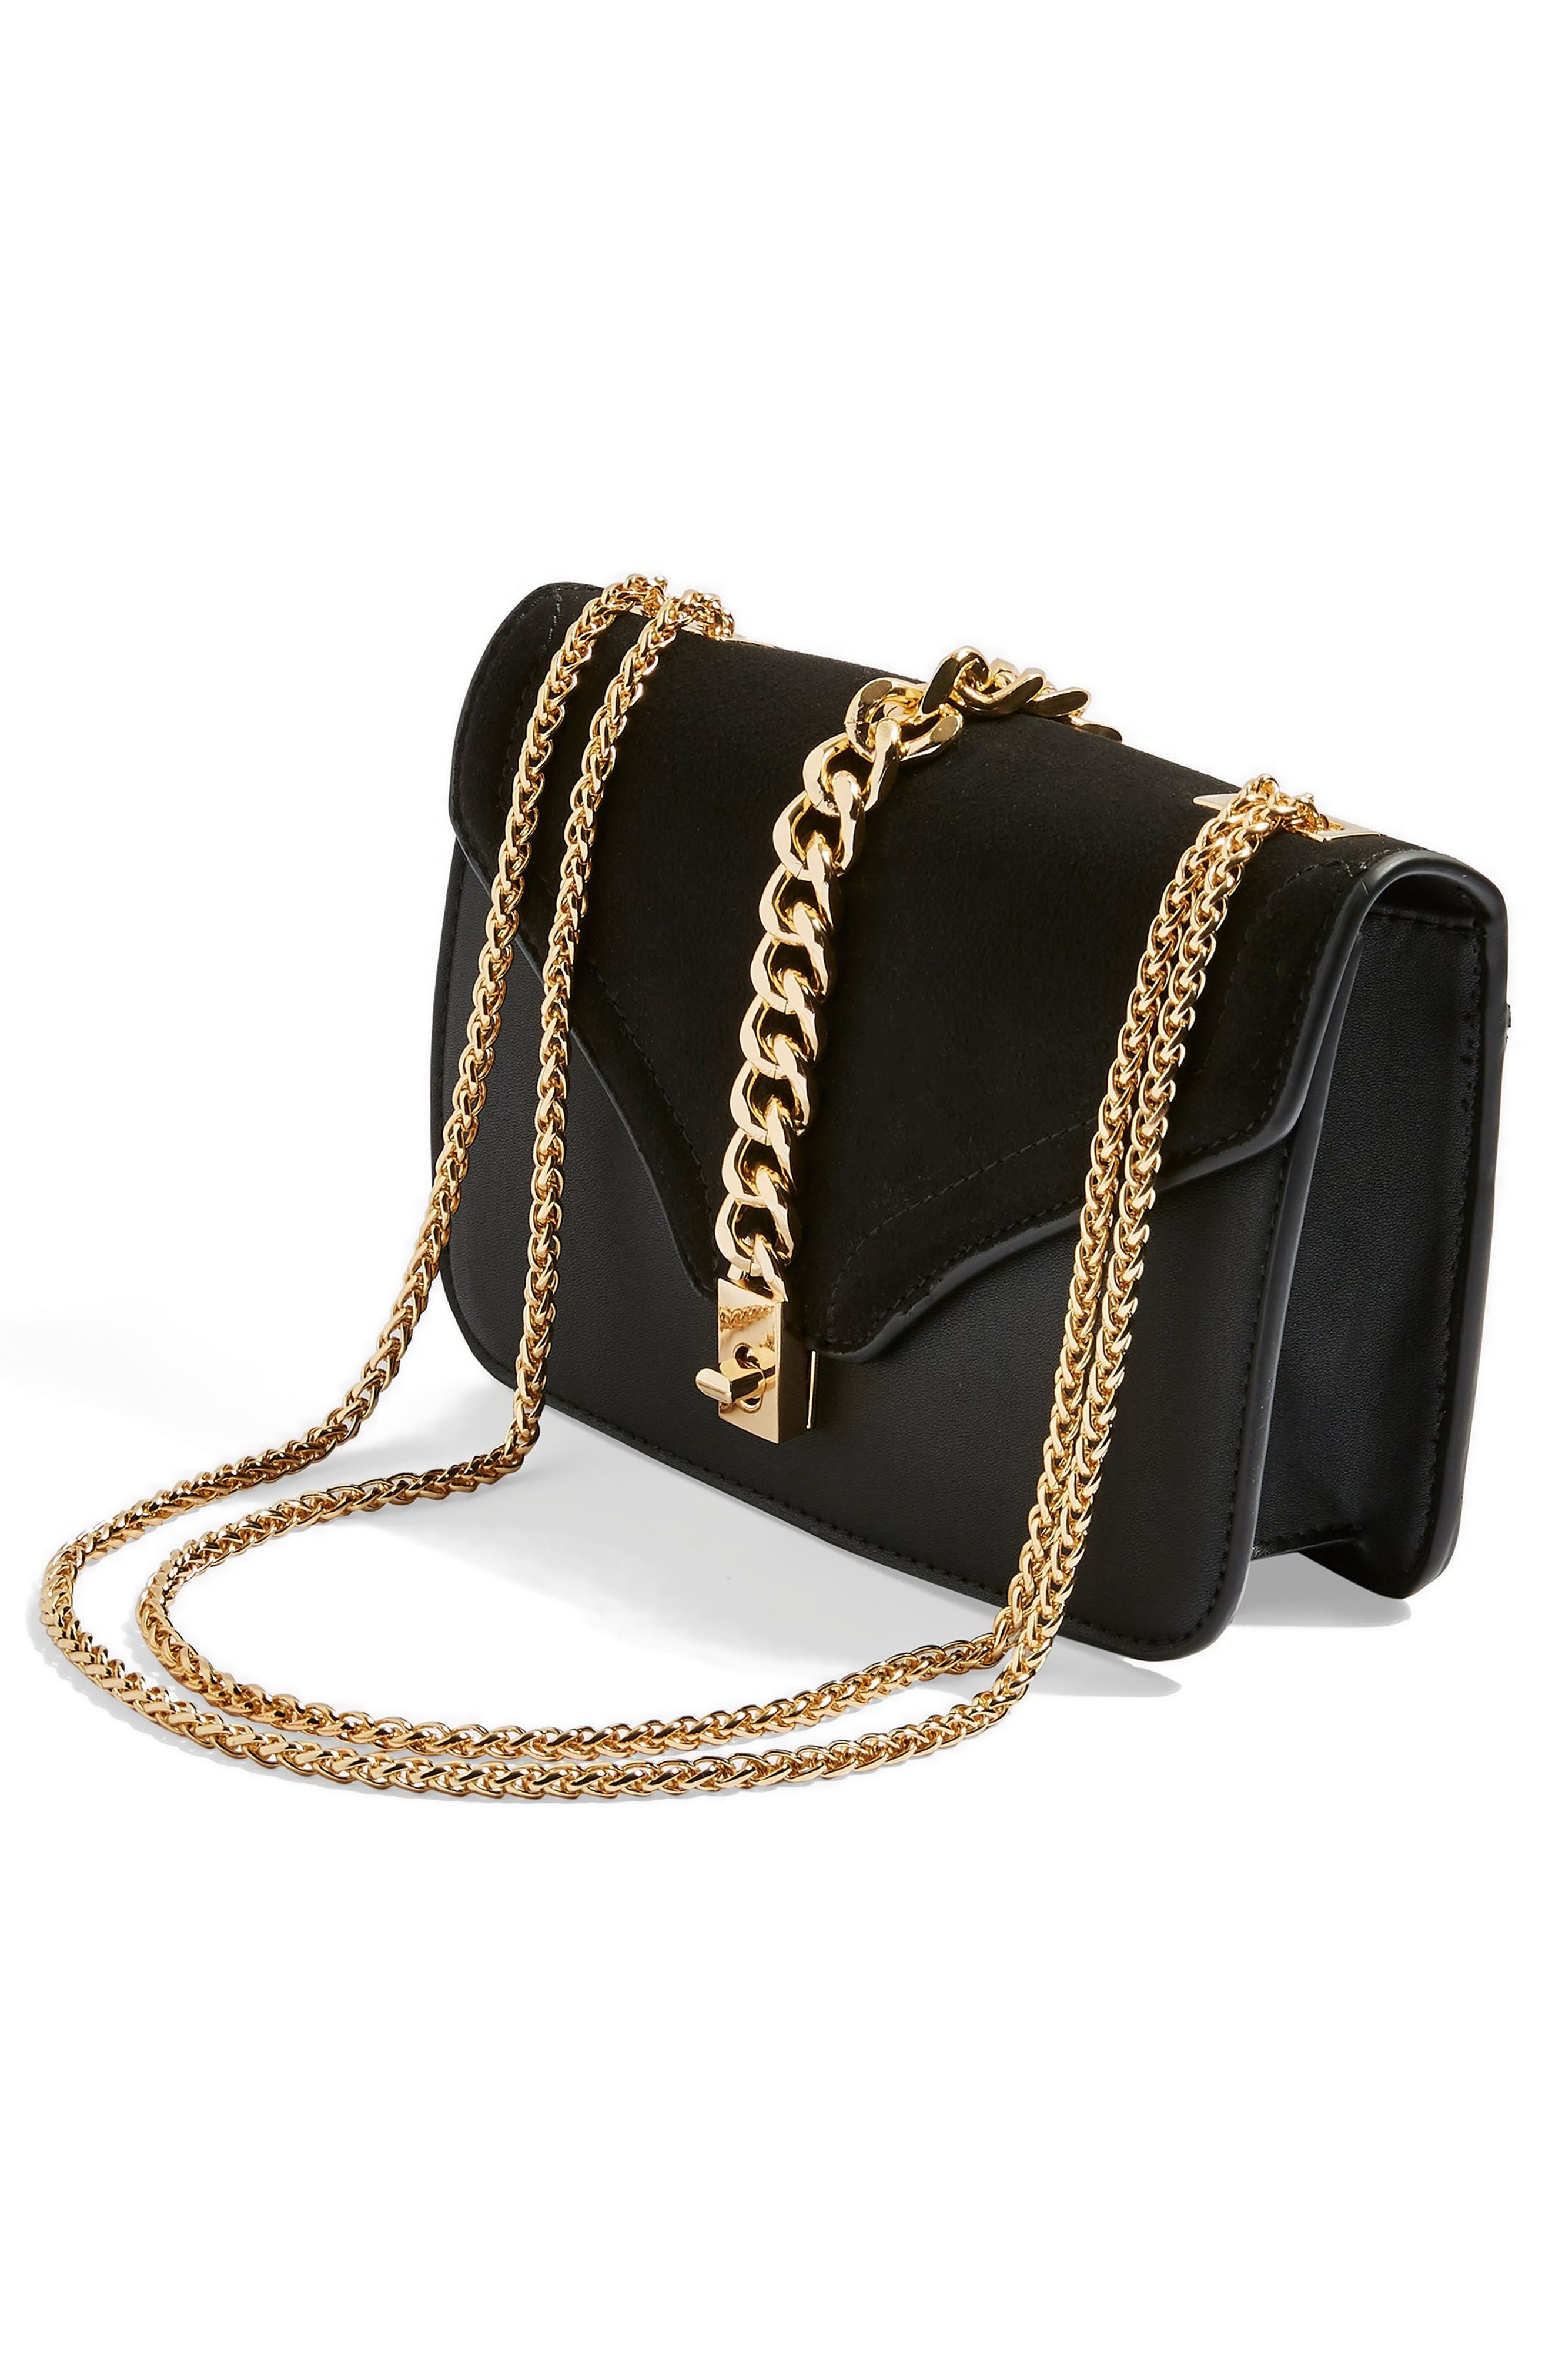 Daisy Chain Faux Leather Crossbody Bag,                             Alternate thumbnail 4, color,                             BLACK MULTI